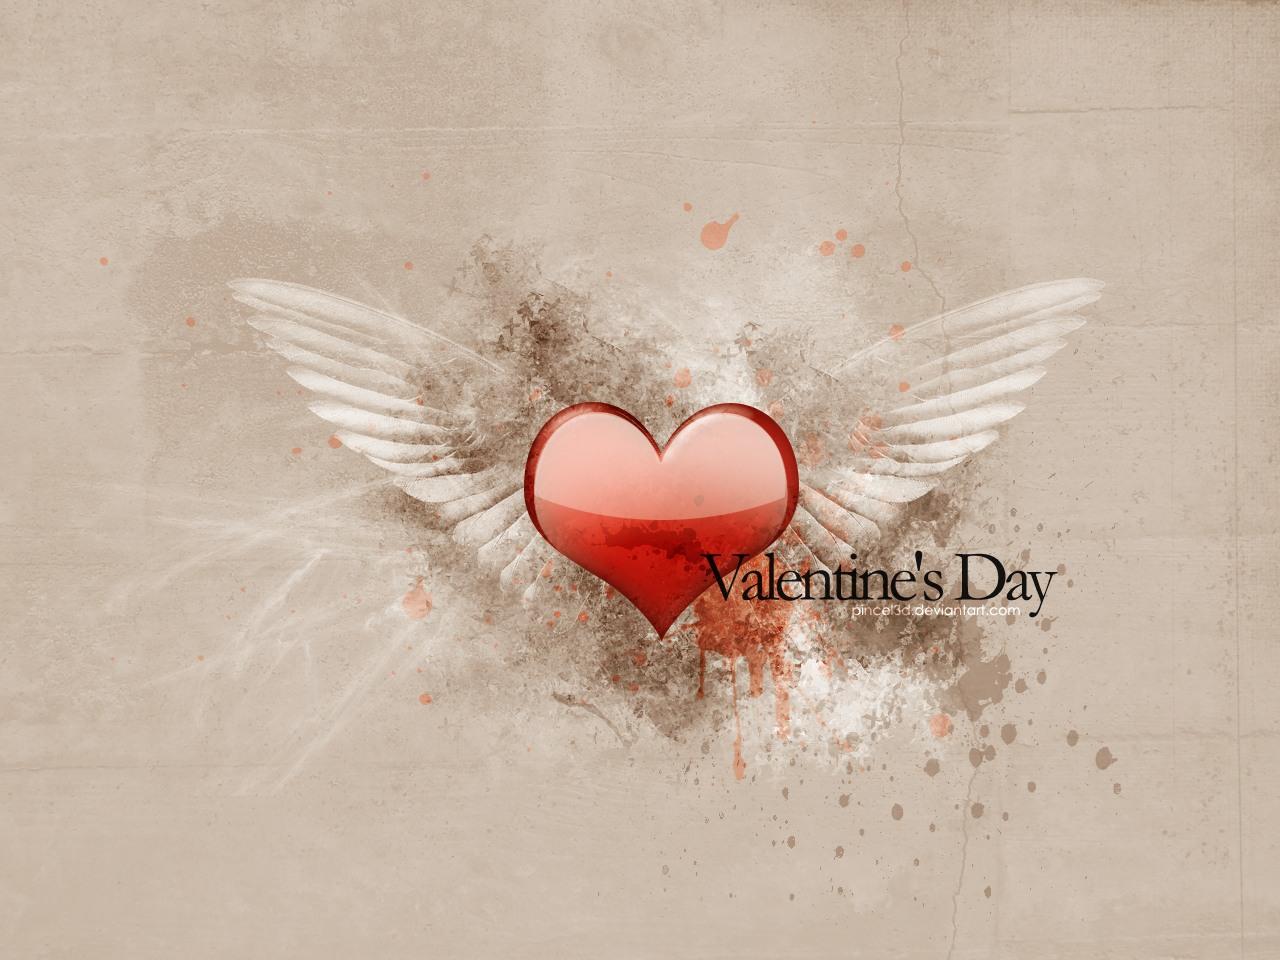 http://4.bp.blogspot.com/-Cb4ESMDuMSc/TVm4x4vJpSI/AAAAAAAAC-I/QukOG-NSLsQ/s1600/valentines-day-wallpaper.jpg